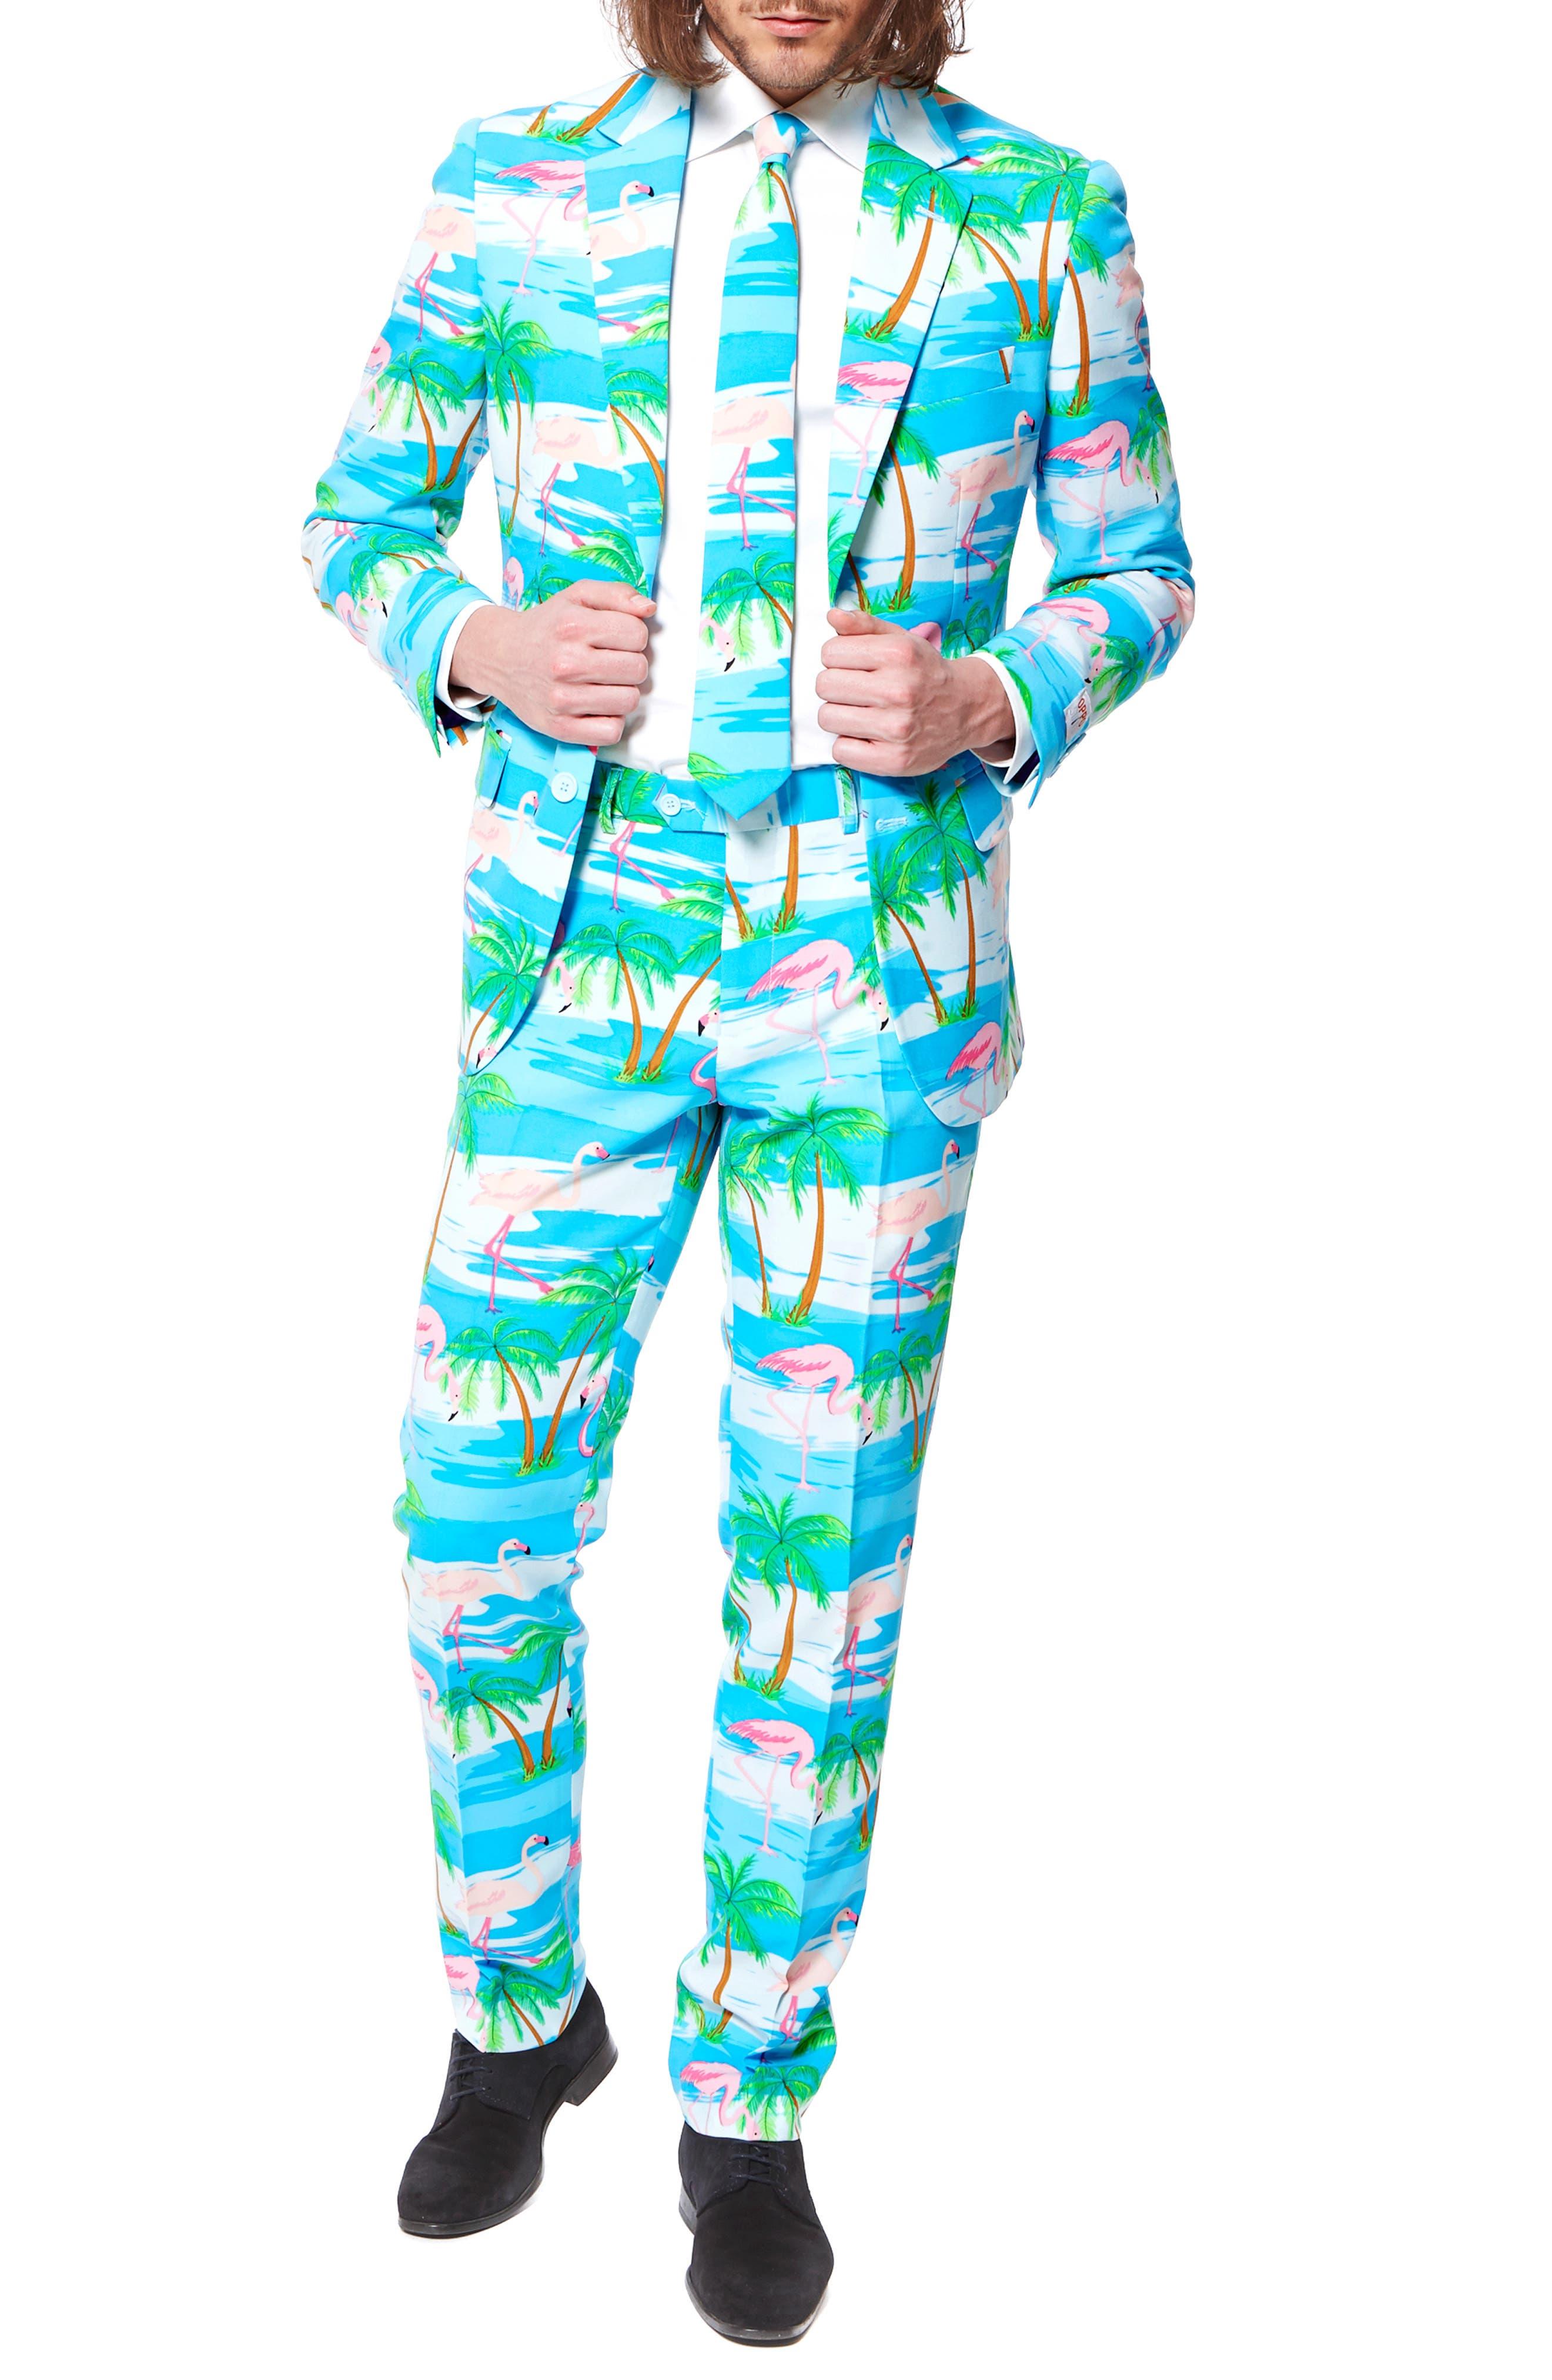 'Flaminguy' Trim Fit Two-Piece Suit with Tie,                             Alternate thumbnail 5, color,                             400